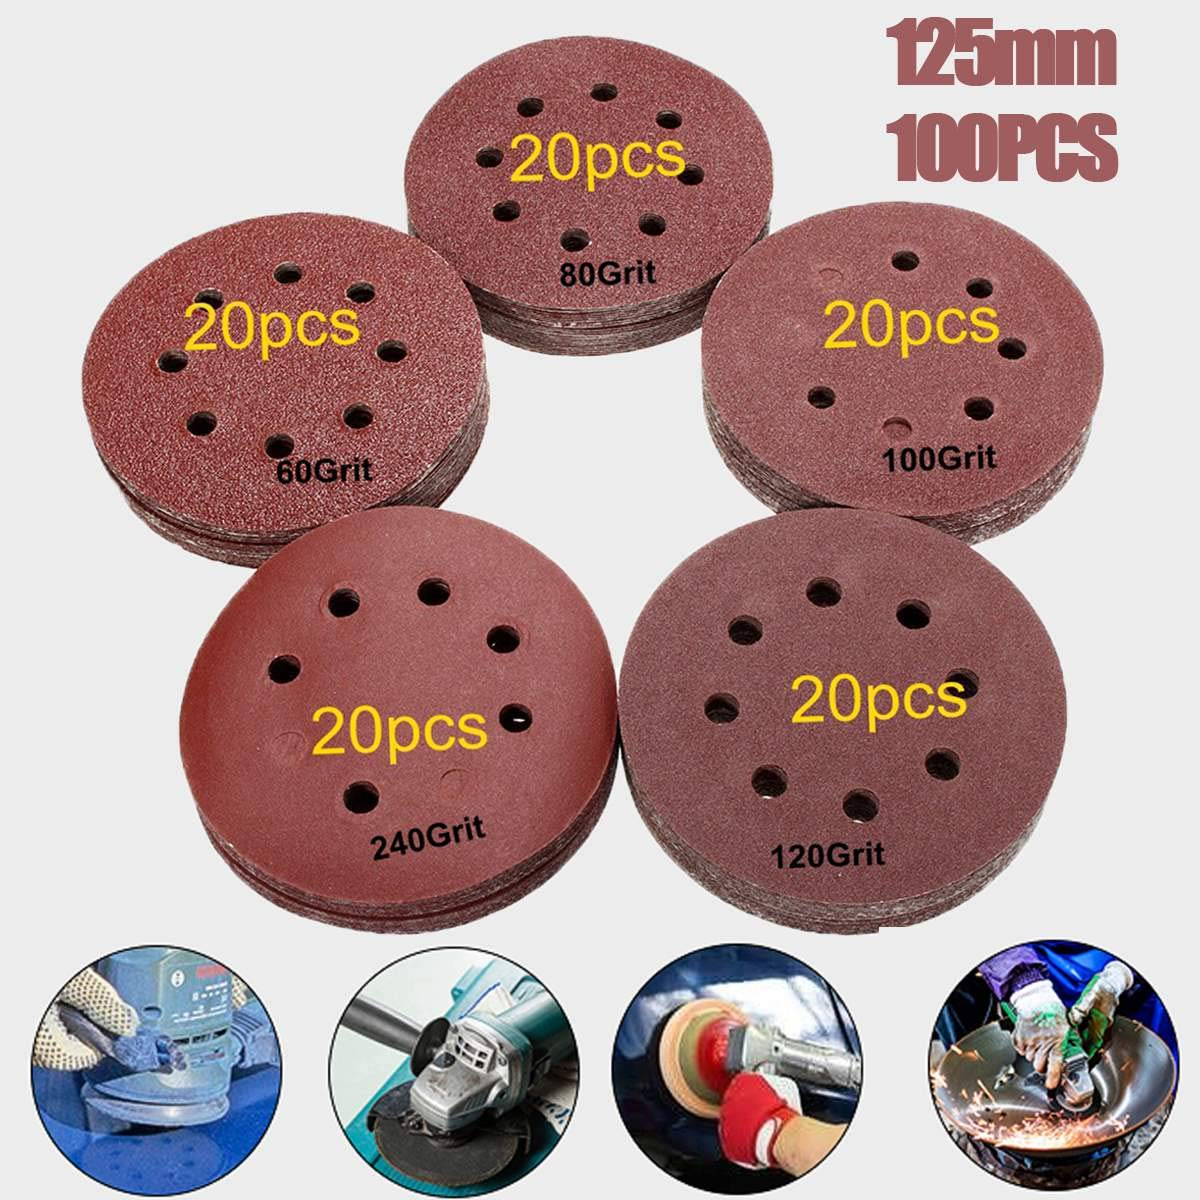 WGang 100pcs 125mm 60 80 100 120 240 Grit Round Shape Sanding Discs Buffing Sheet Sandpaper 8 Hole Sander Polishing Pad Each of 20 by WGang